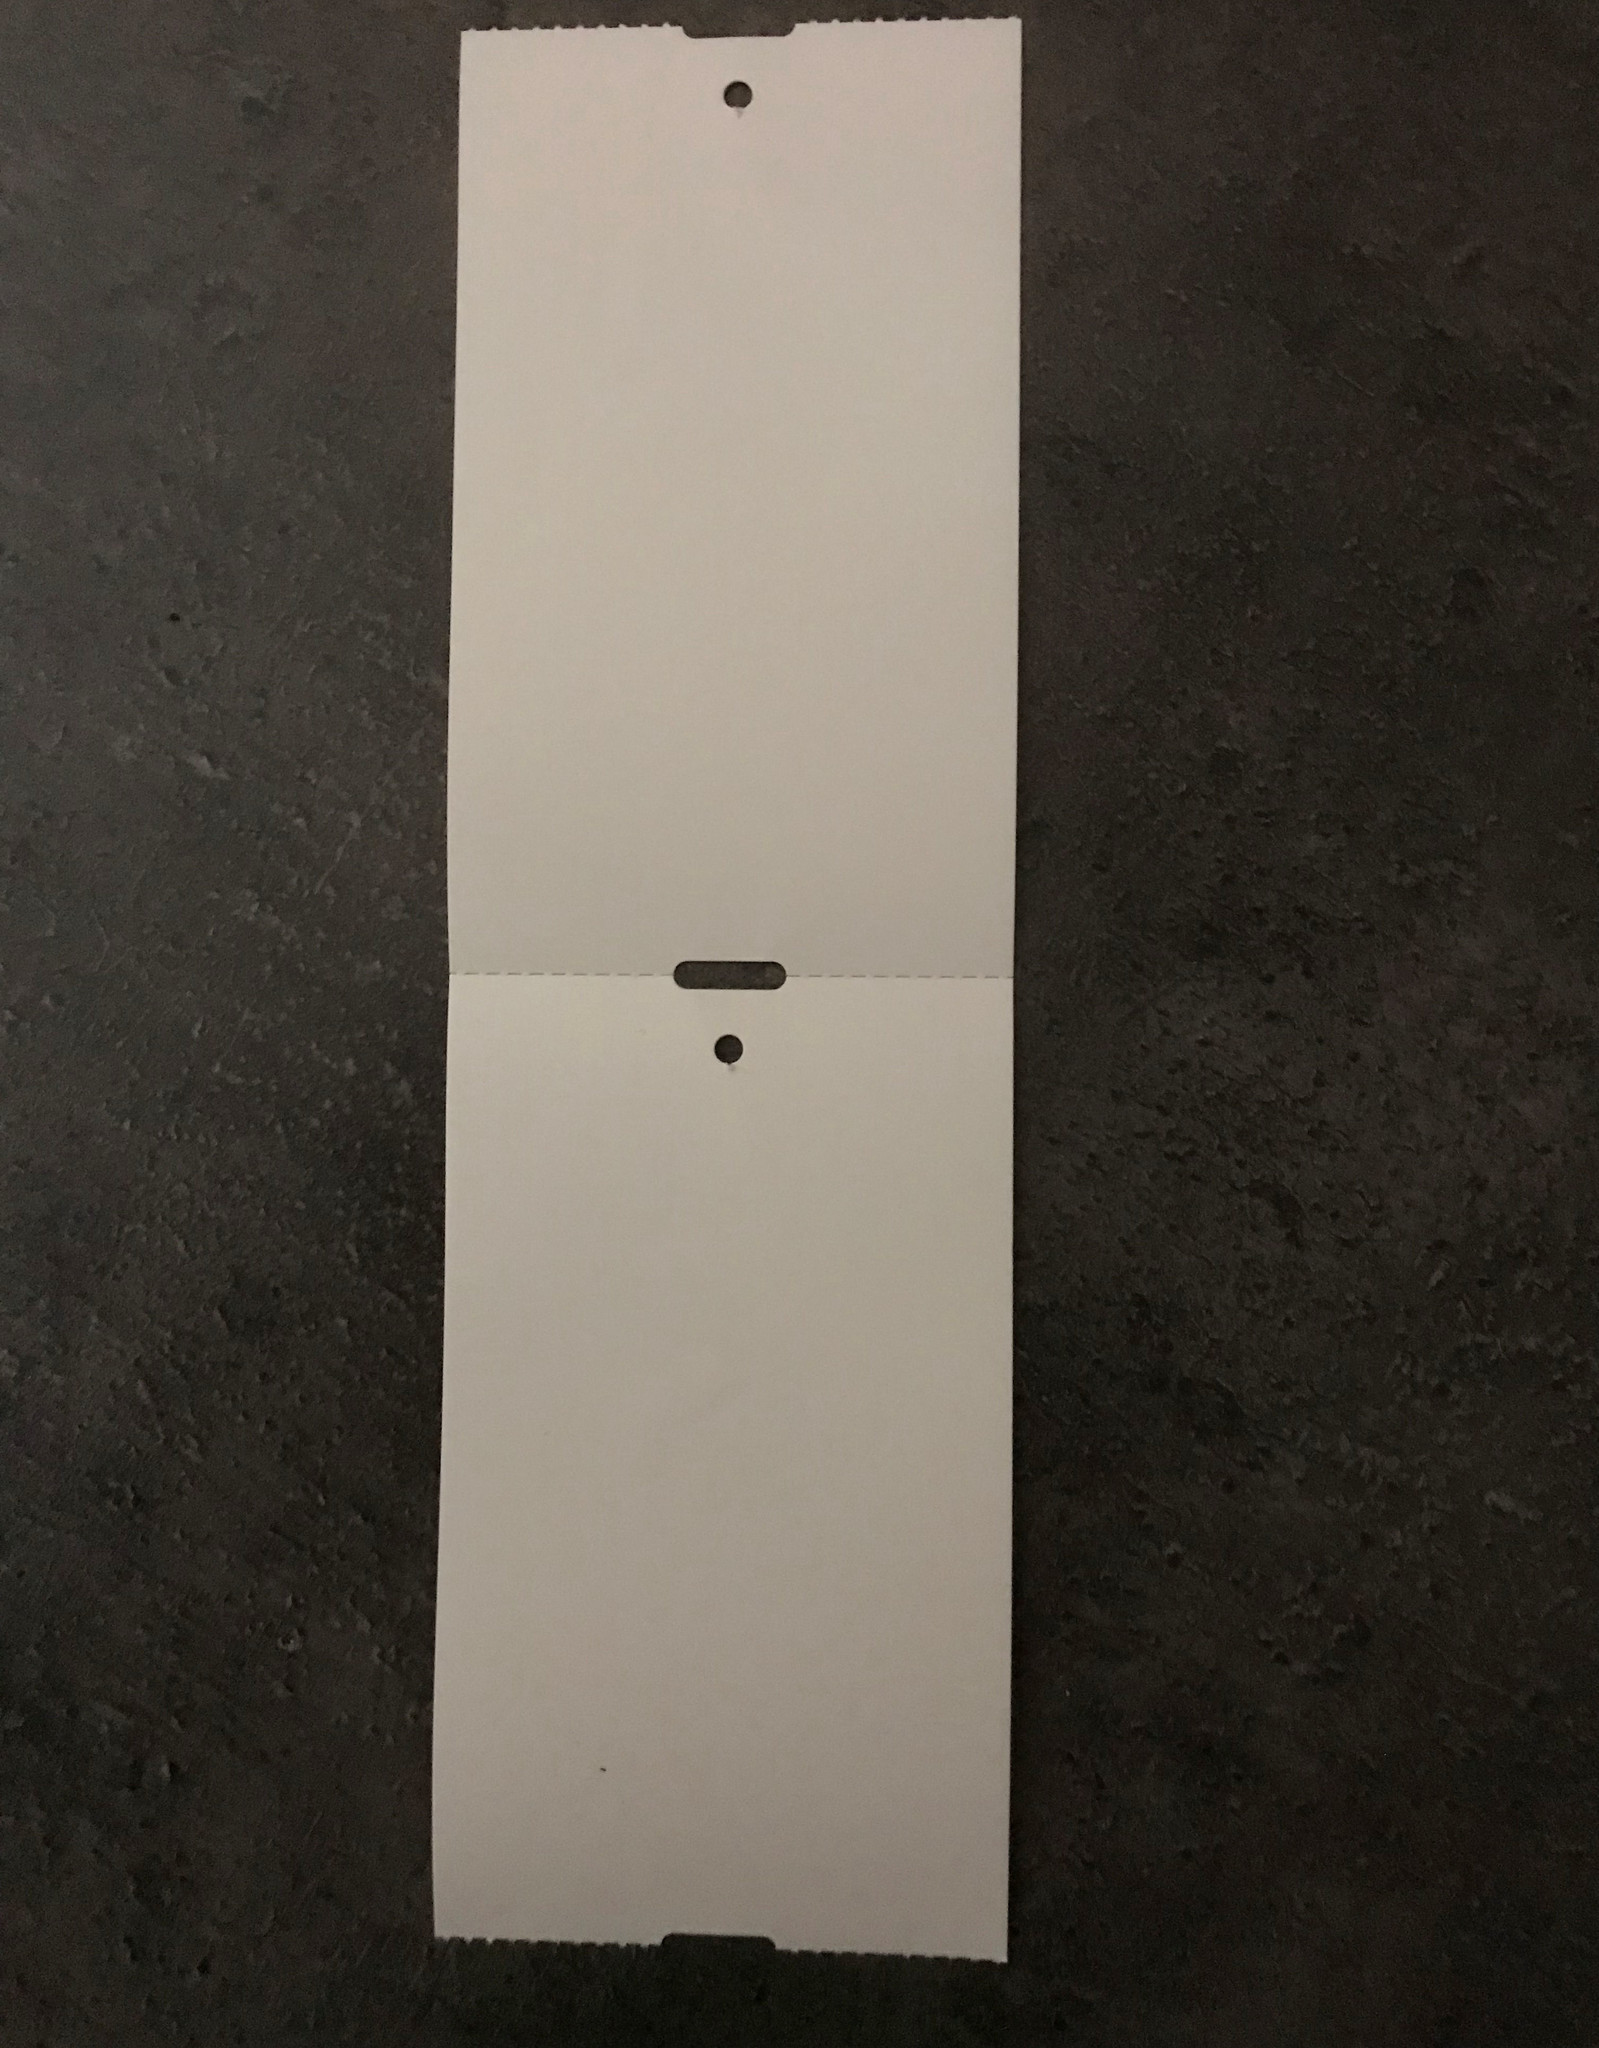 kledigkaartje / schapkaartje 60x101mm